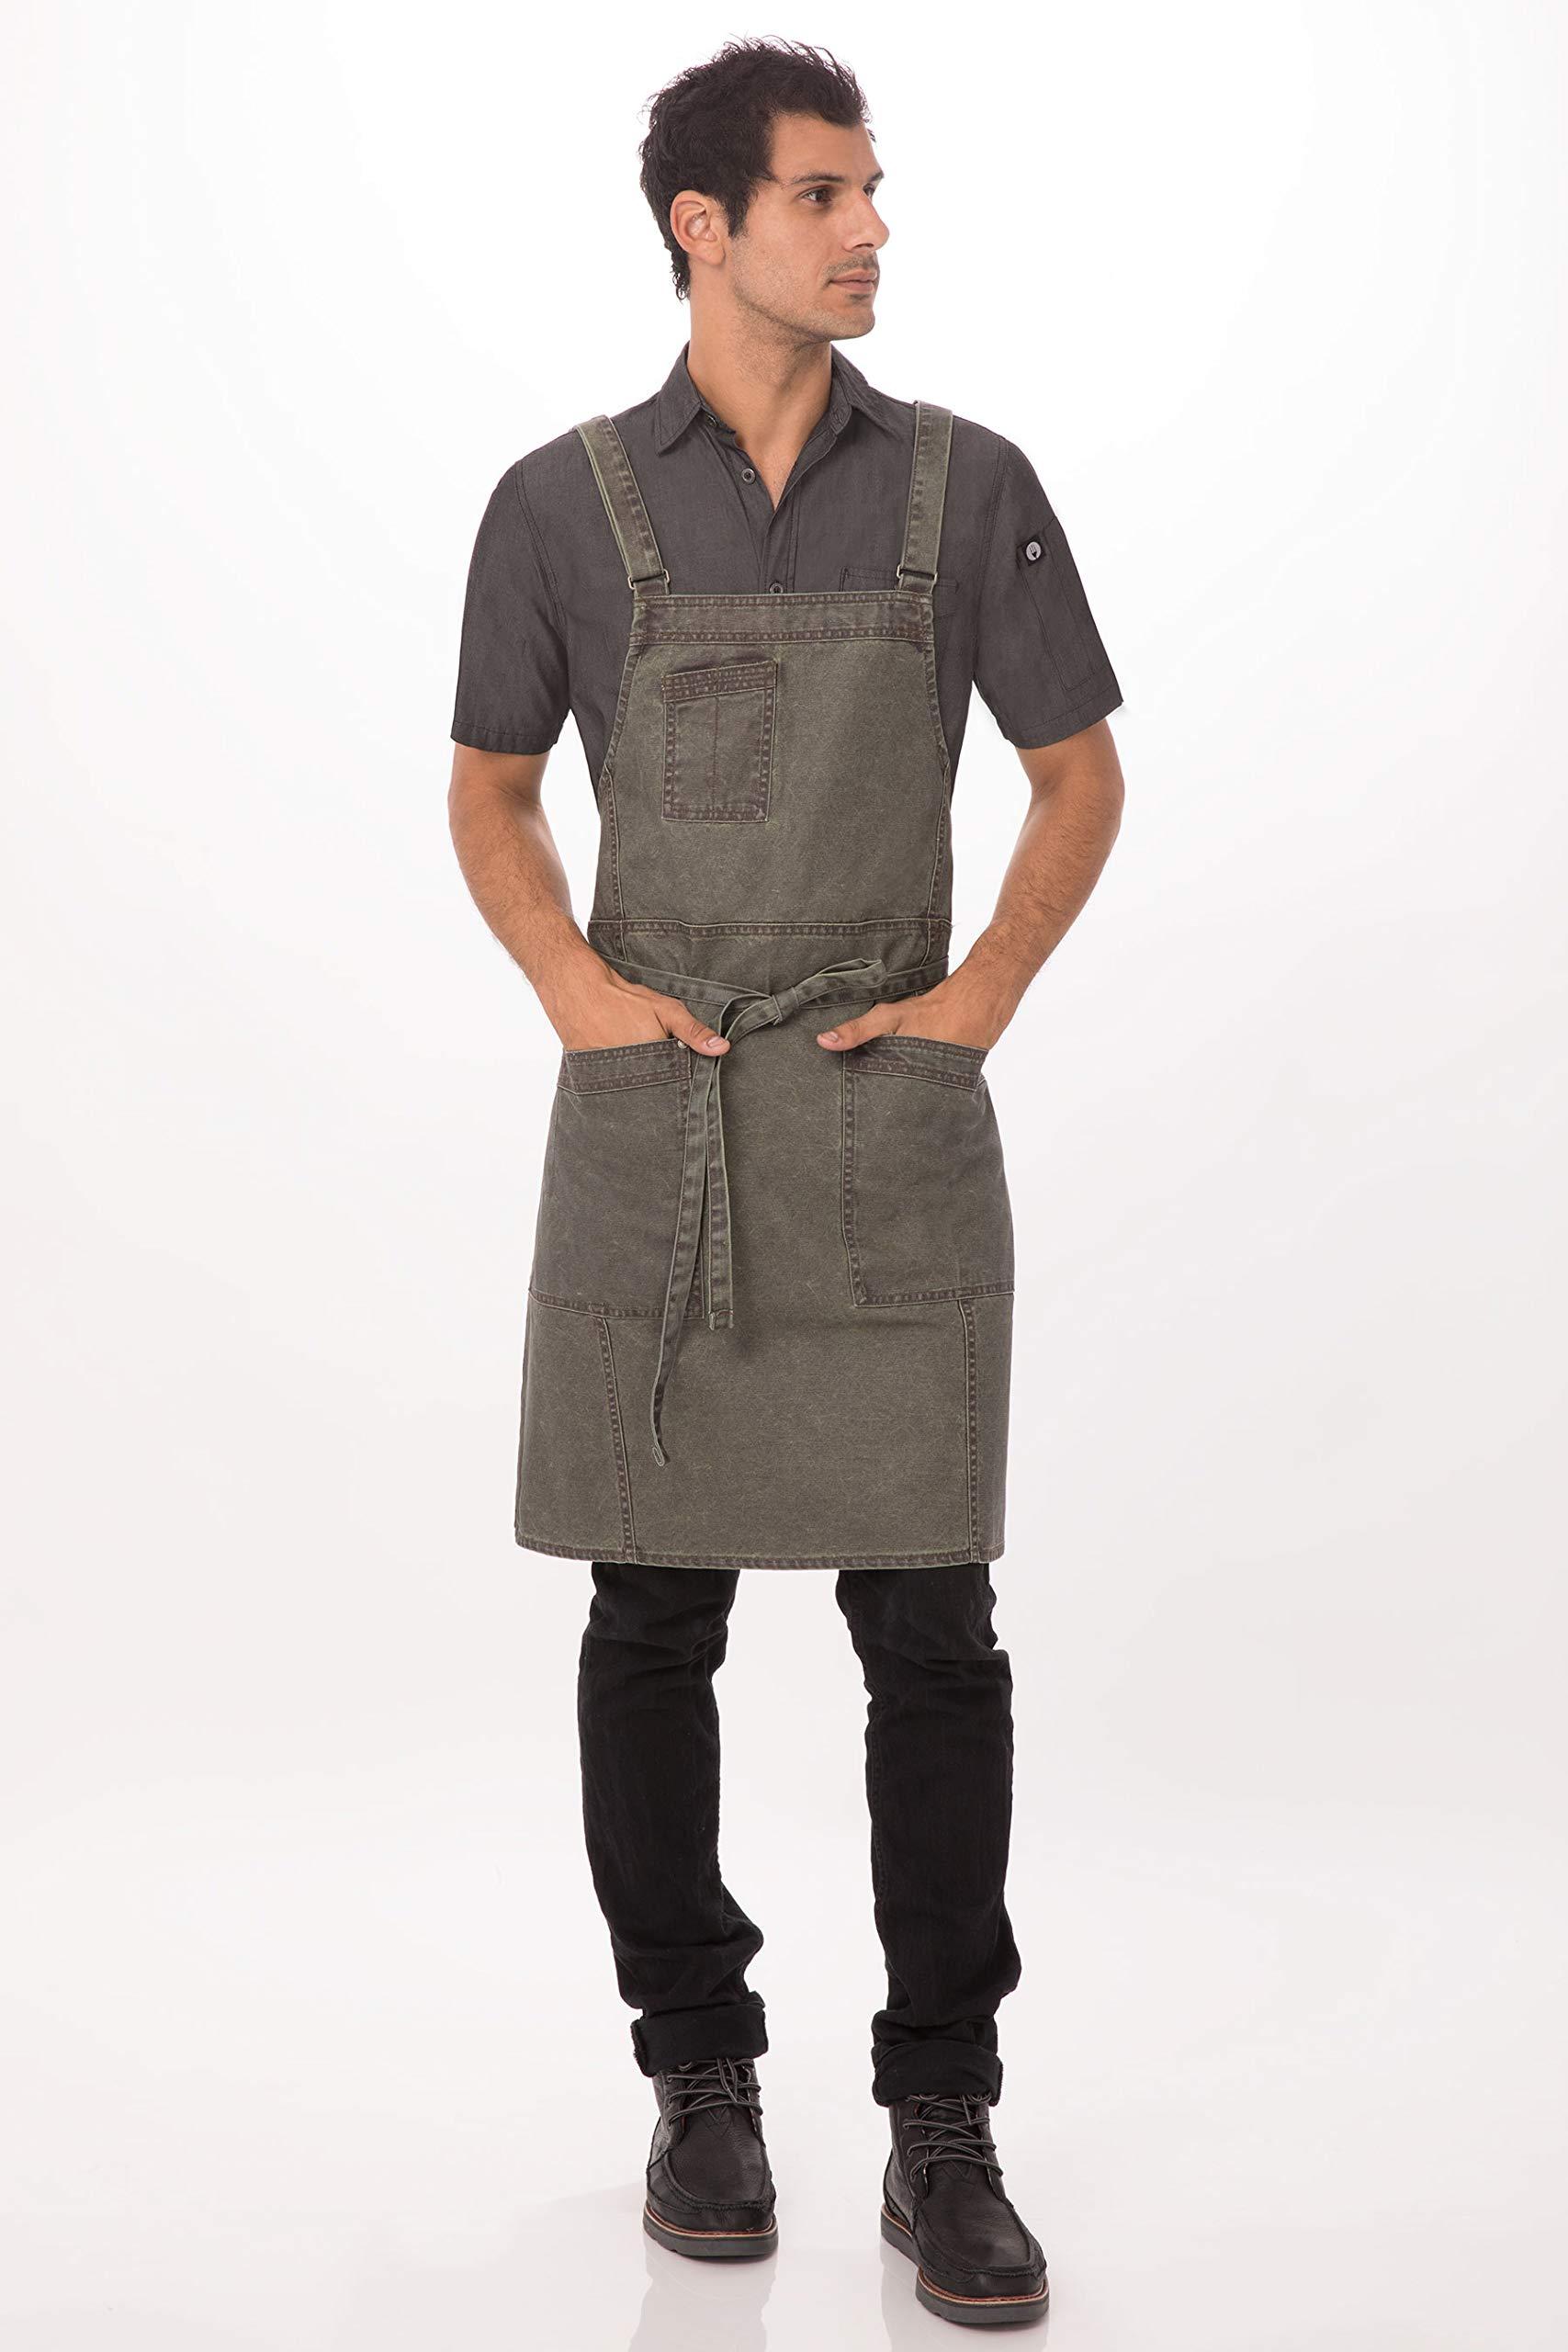 Chef Works Denver Cross-Back Bib Apron, Olive Wood, One Size by Chef Works